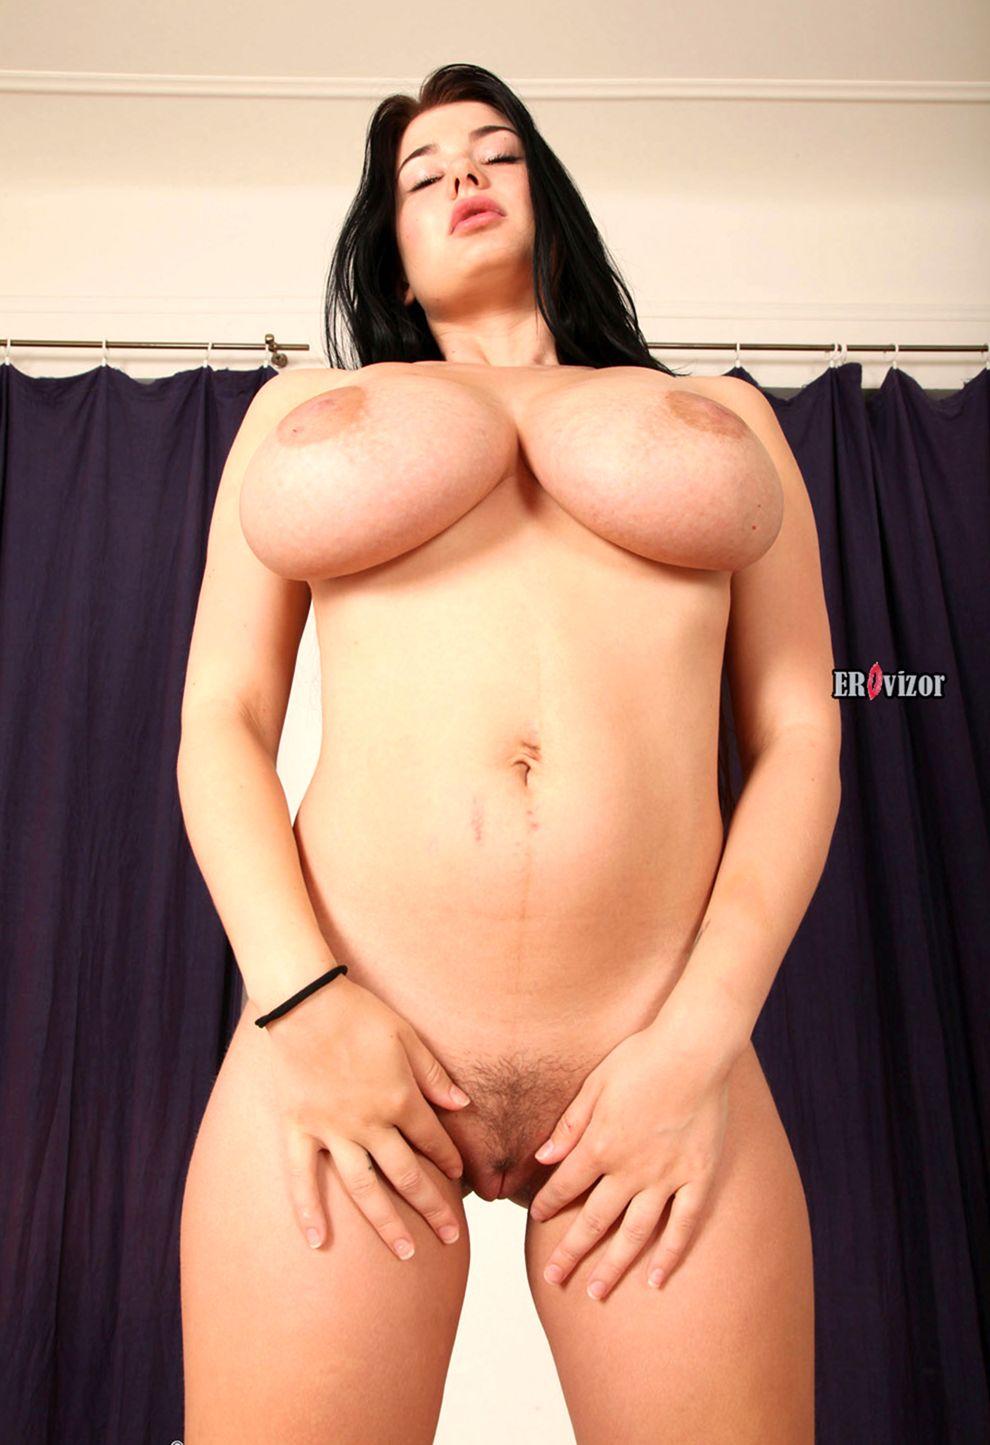 Scarlett-Lee-with-Big-Naturals-1 (12)